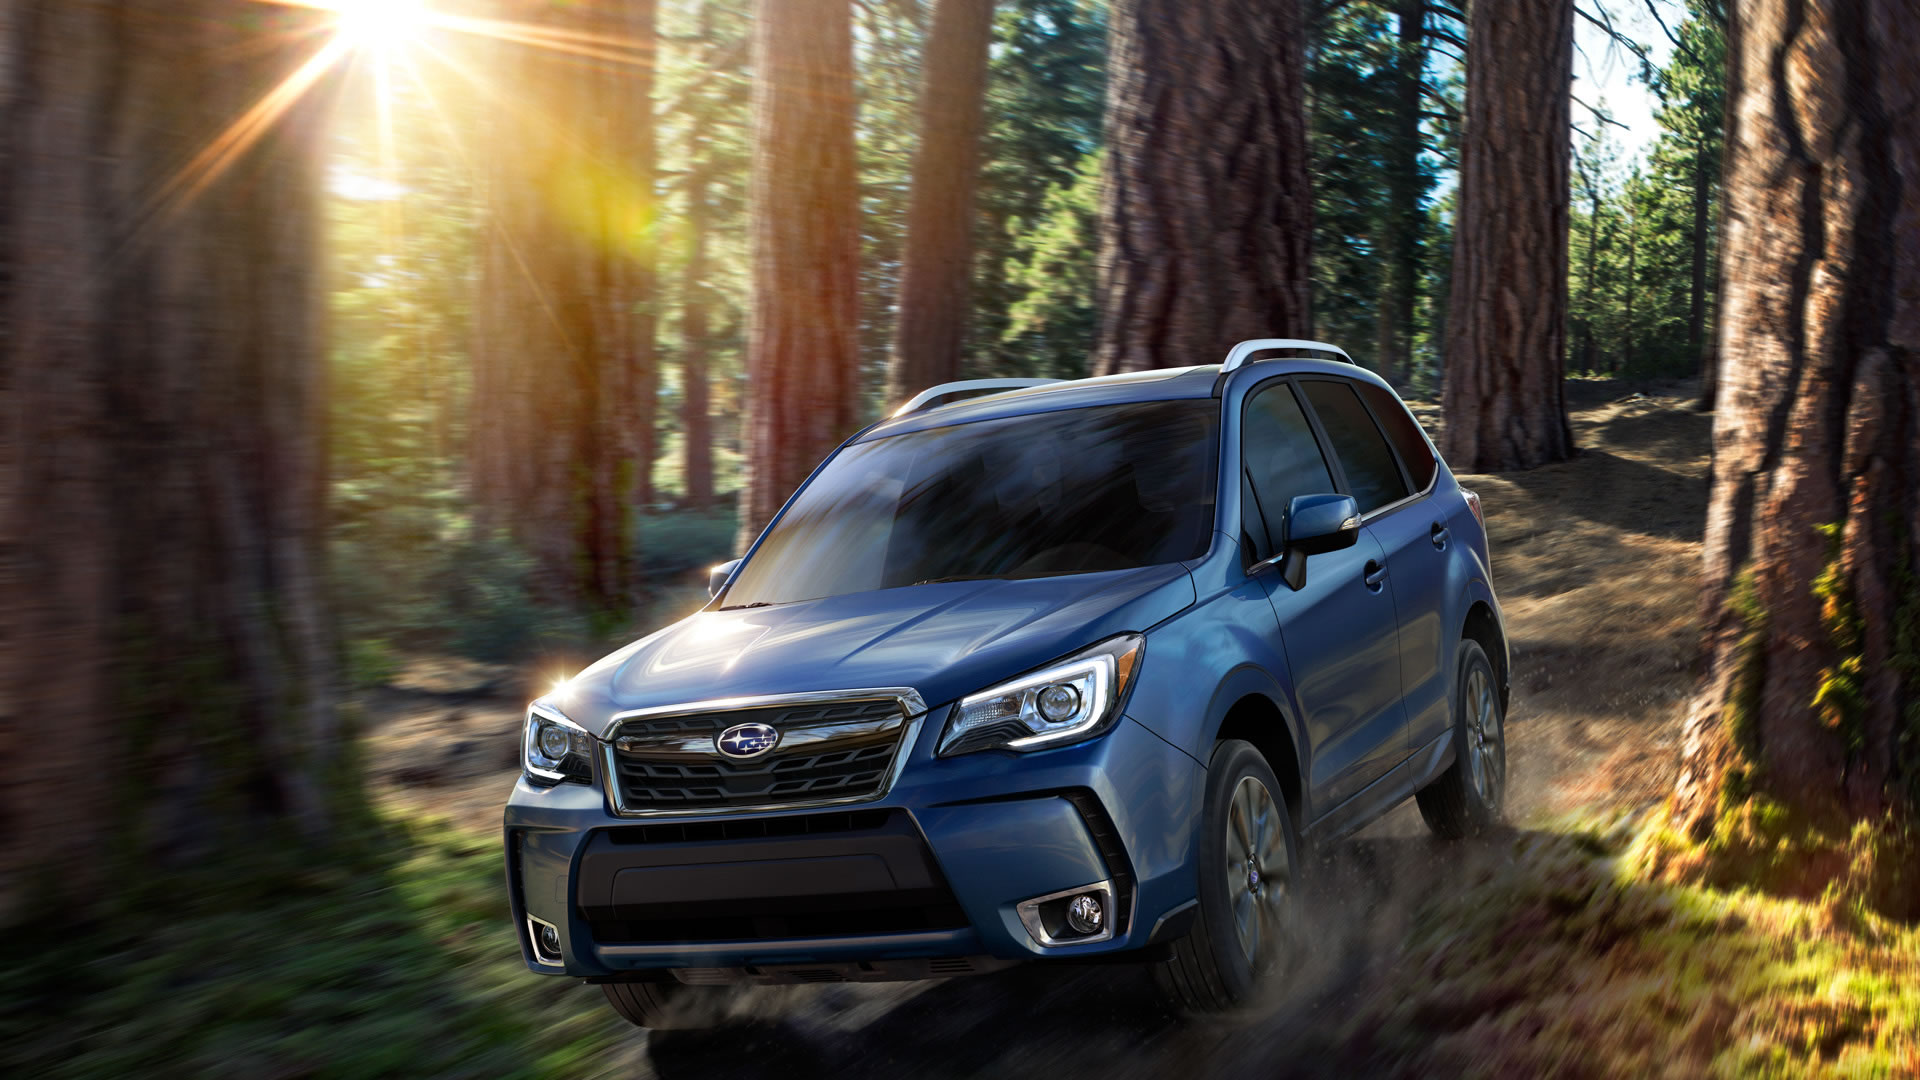 Subaru Forester – new car under $25,000